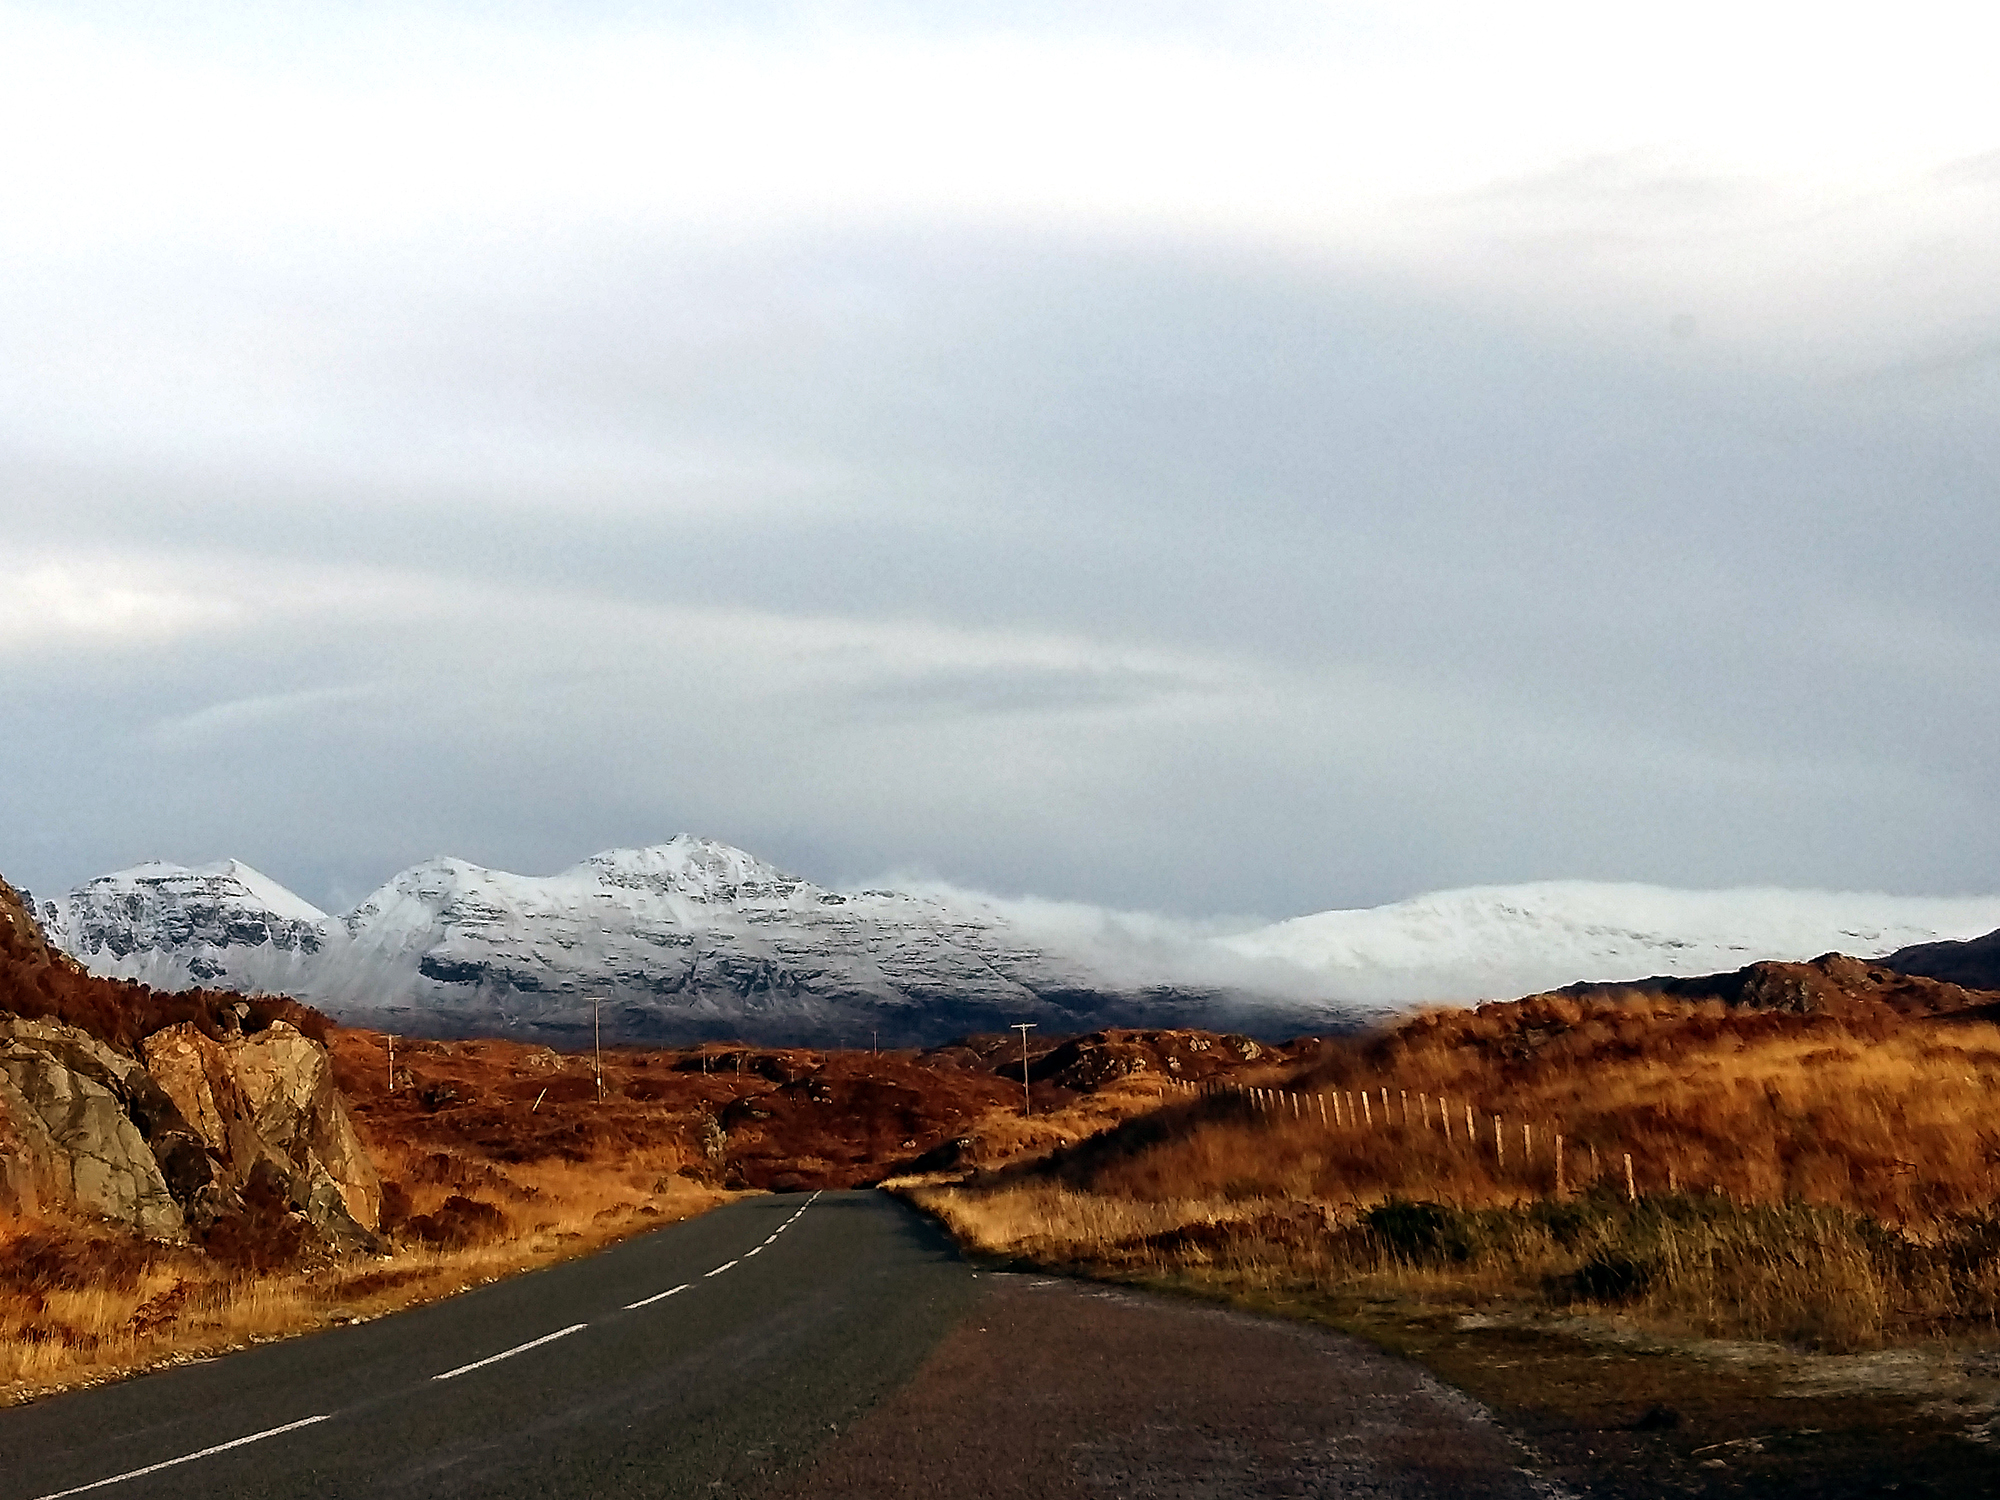 NC500 Roadtour view with snowed mountain